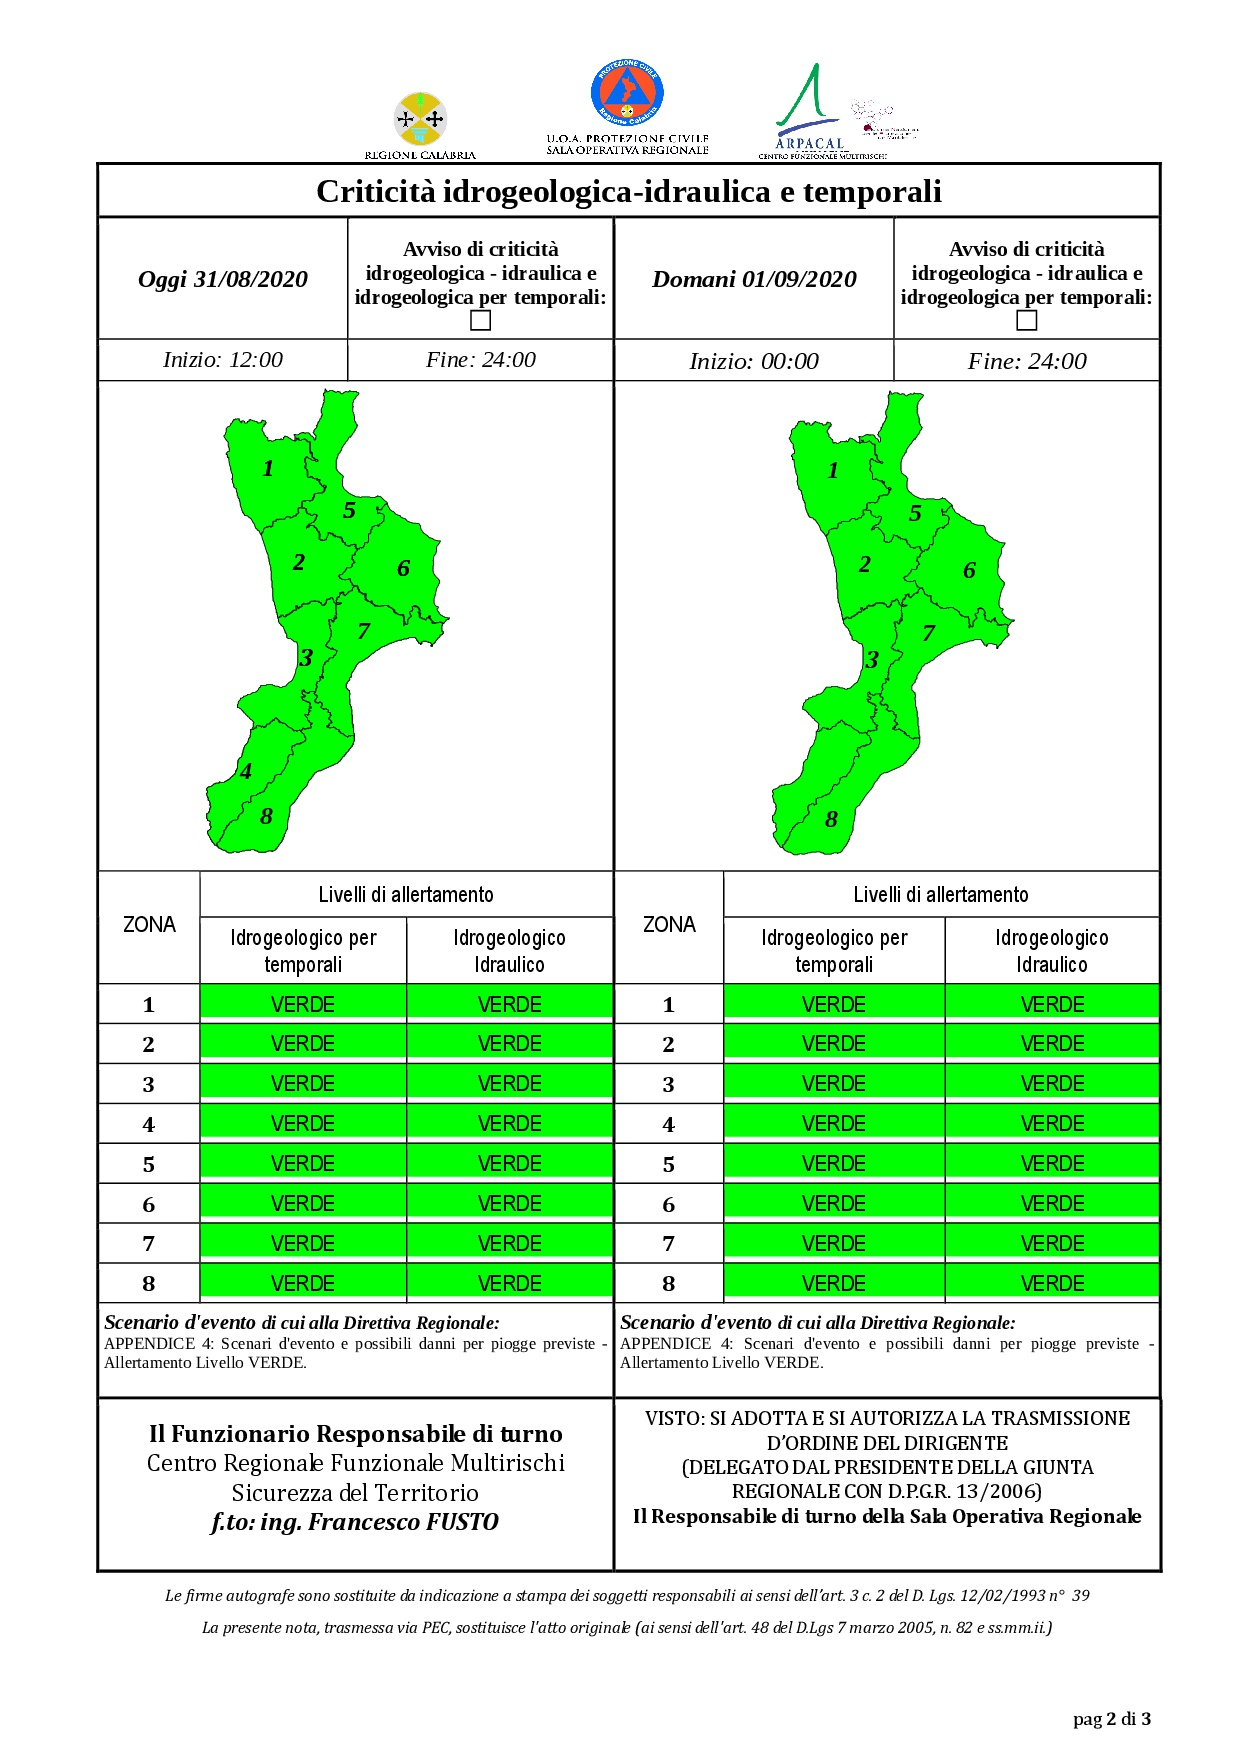 Criticità idrogeologica-idraulica e temporali in Calabria 31-08-2020